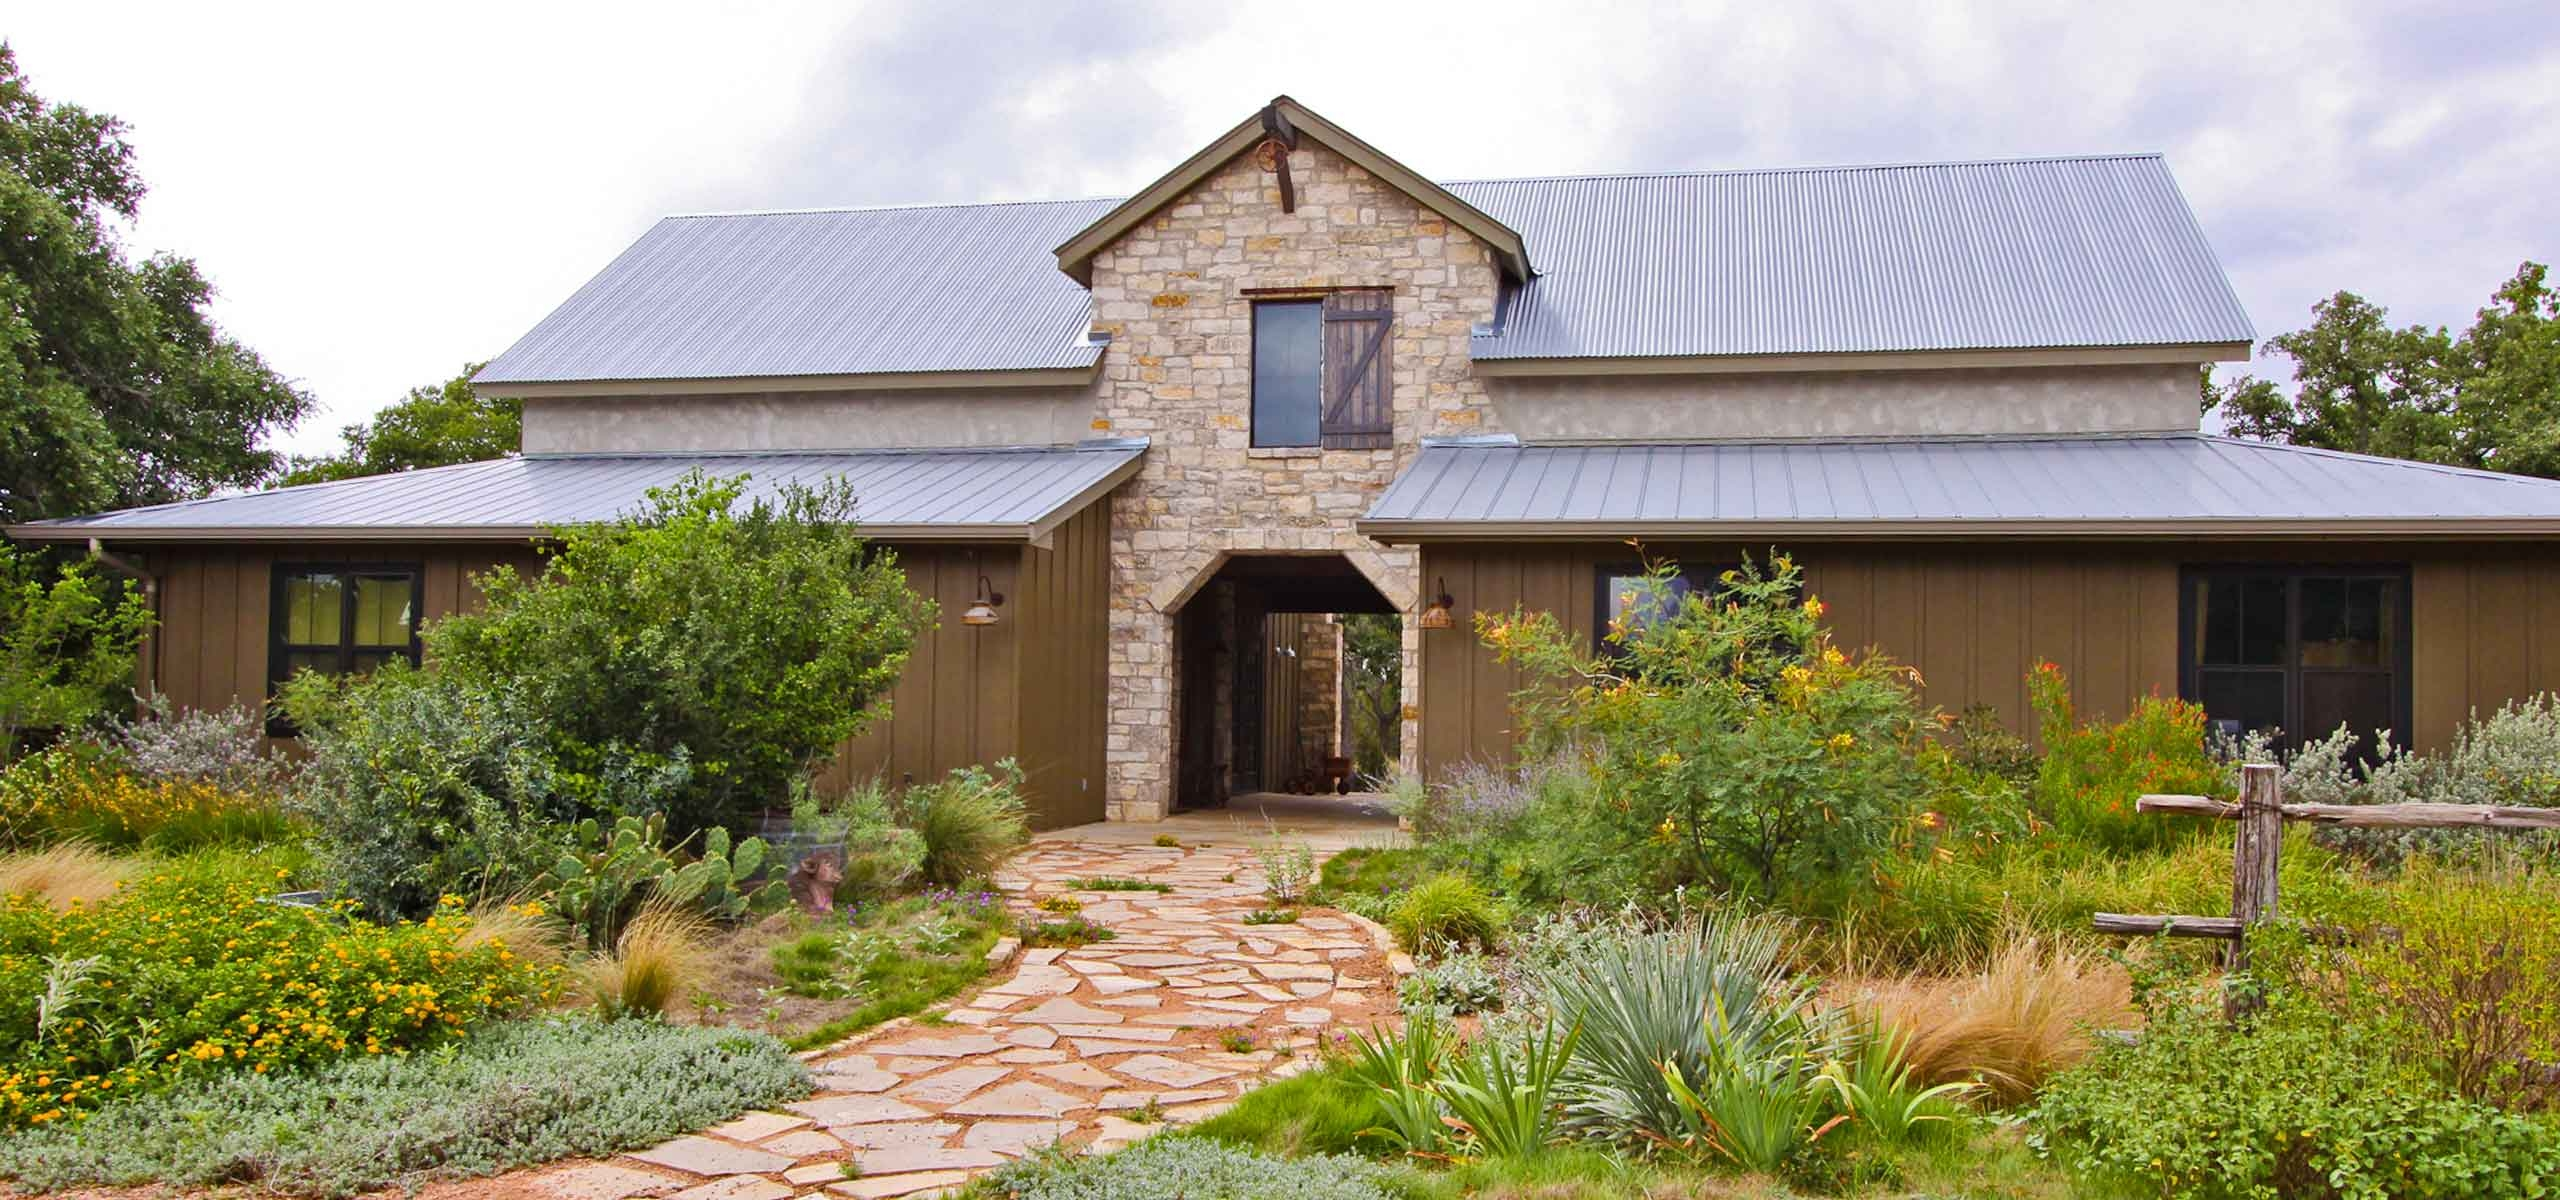 Home | Texas Home Plans